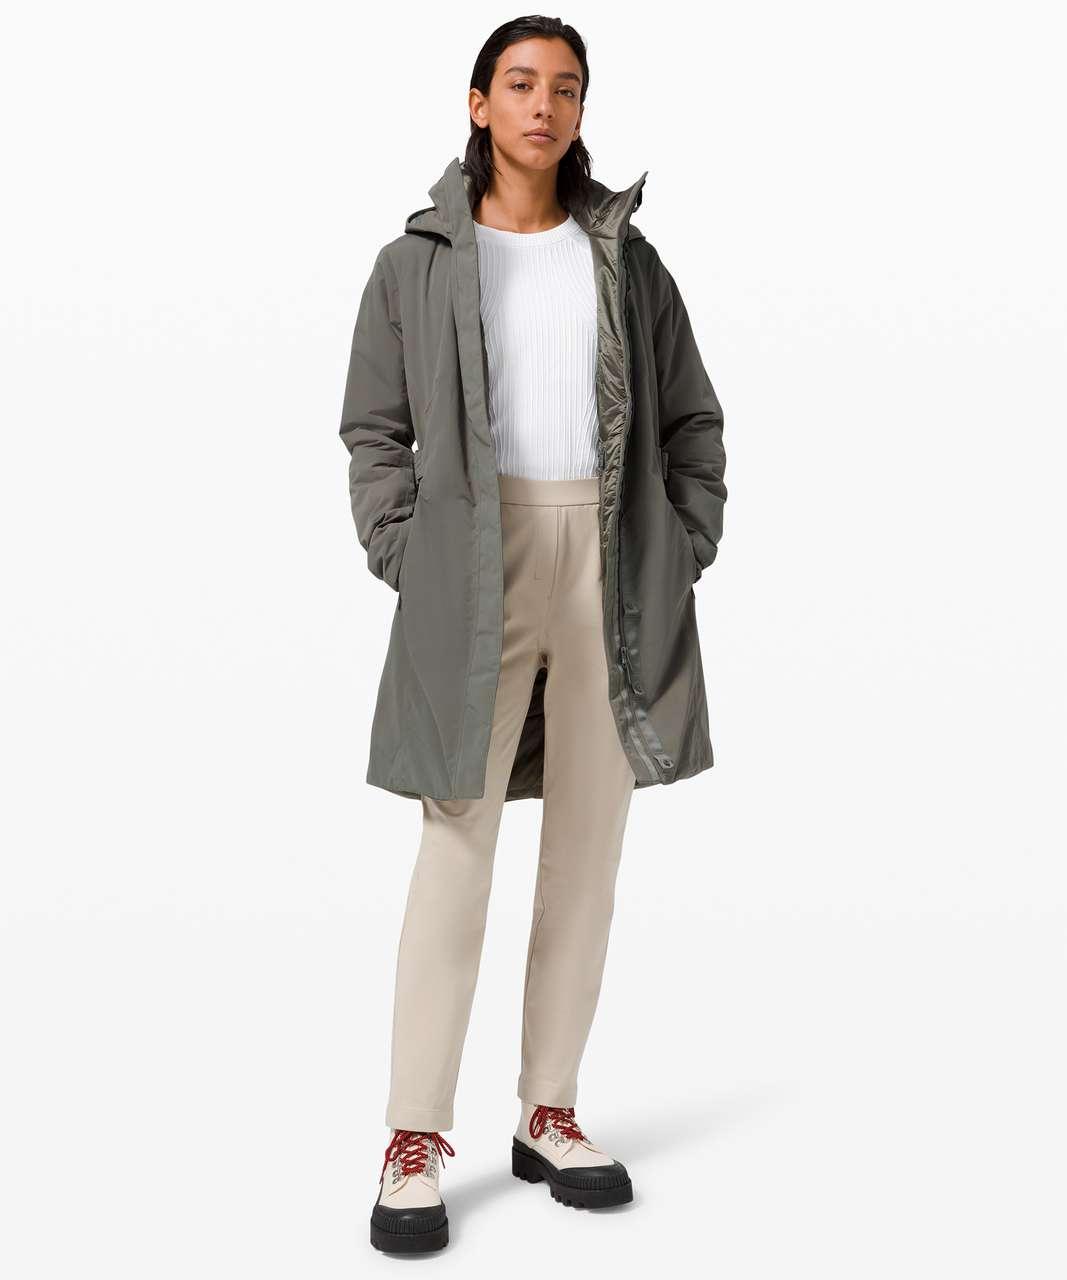 Lululemon Apres It All Jacket - Grey Sage